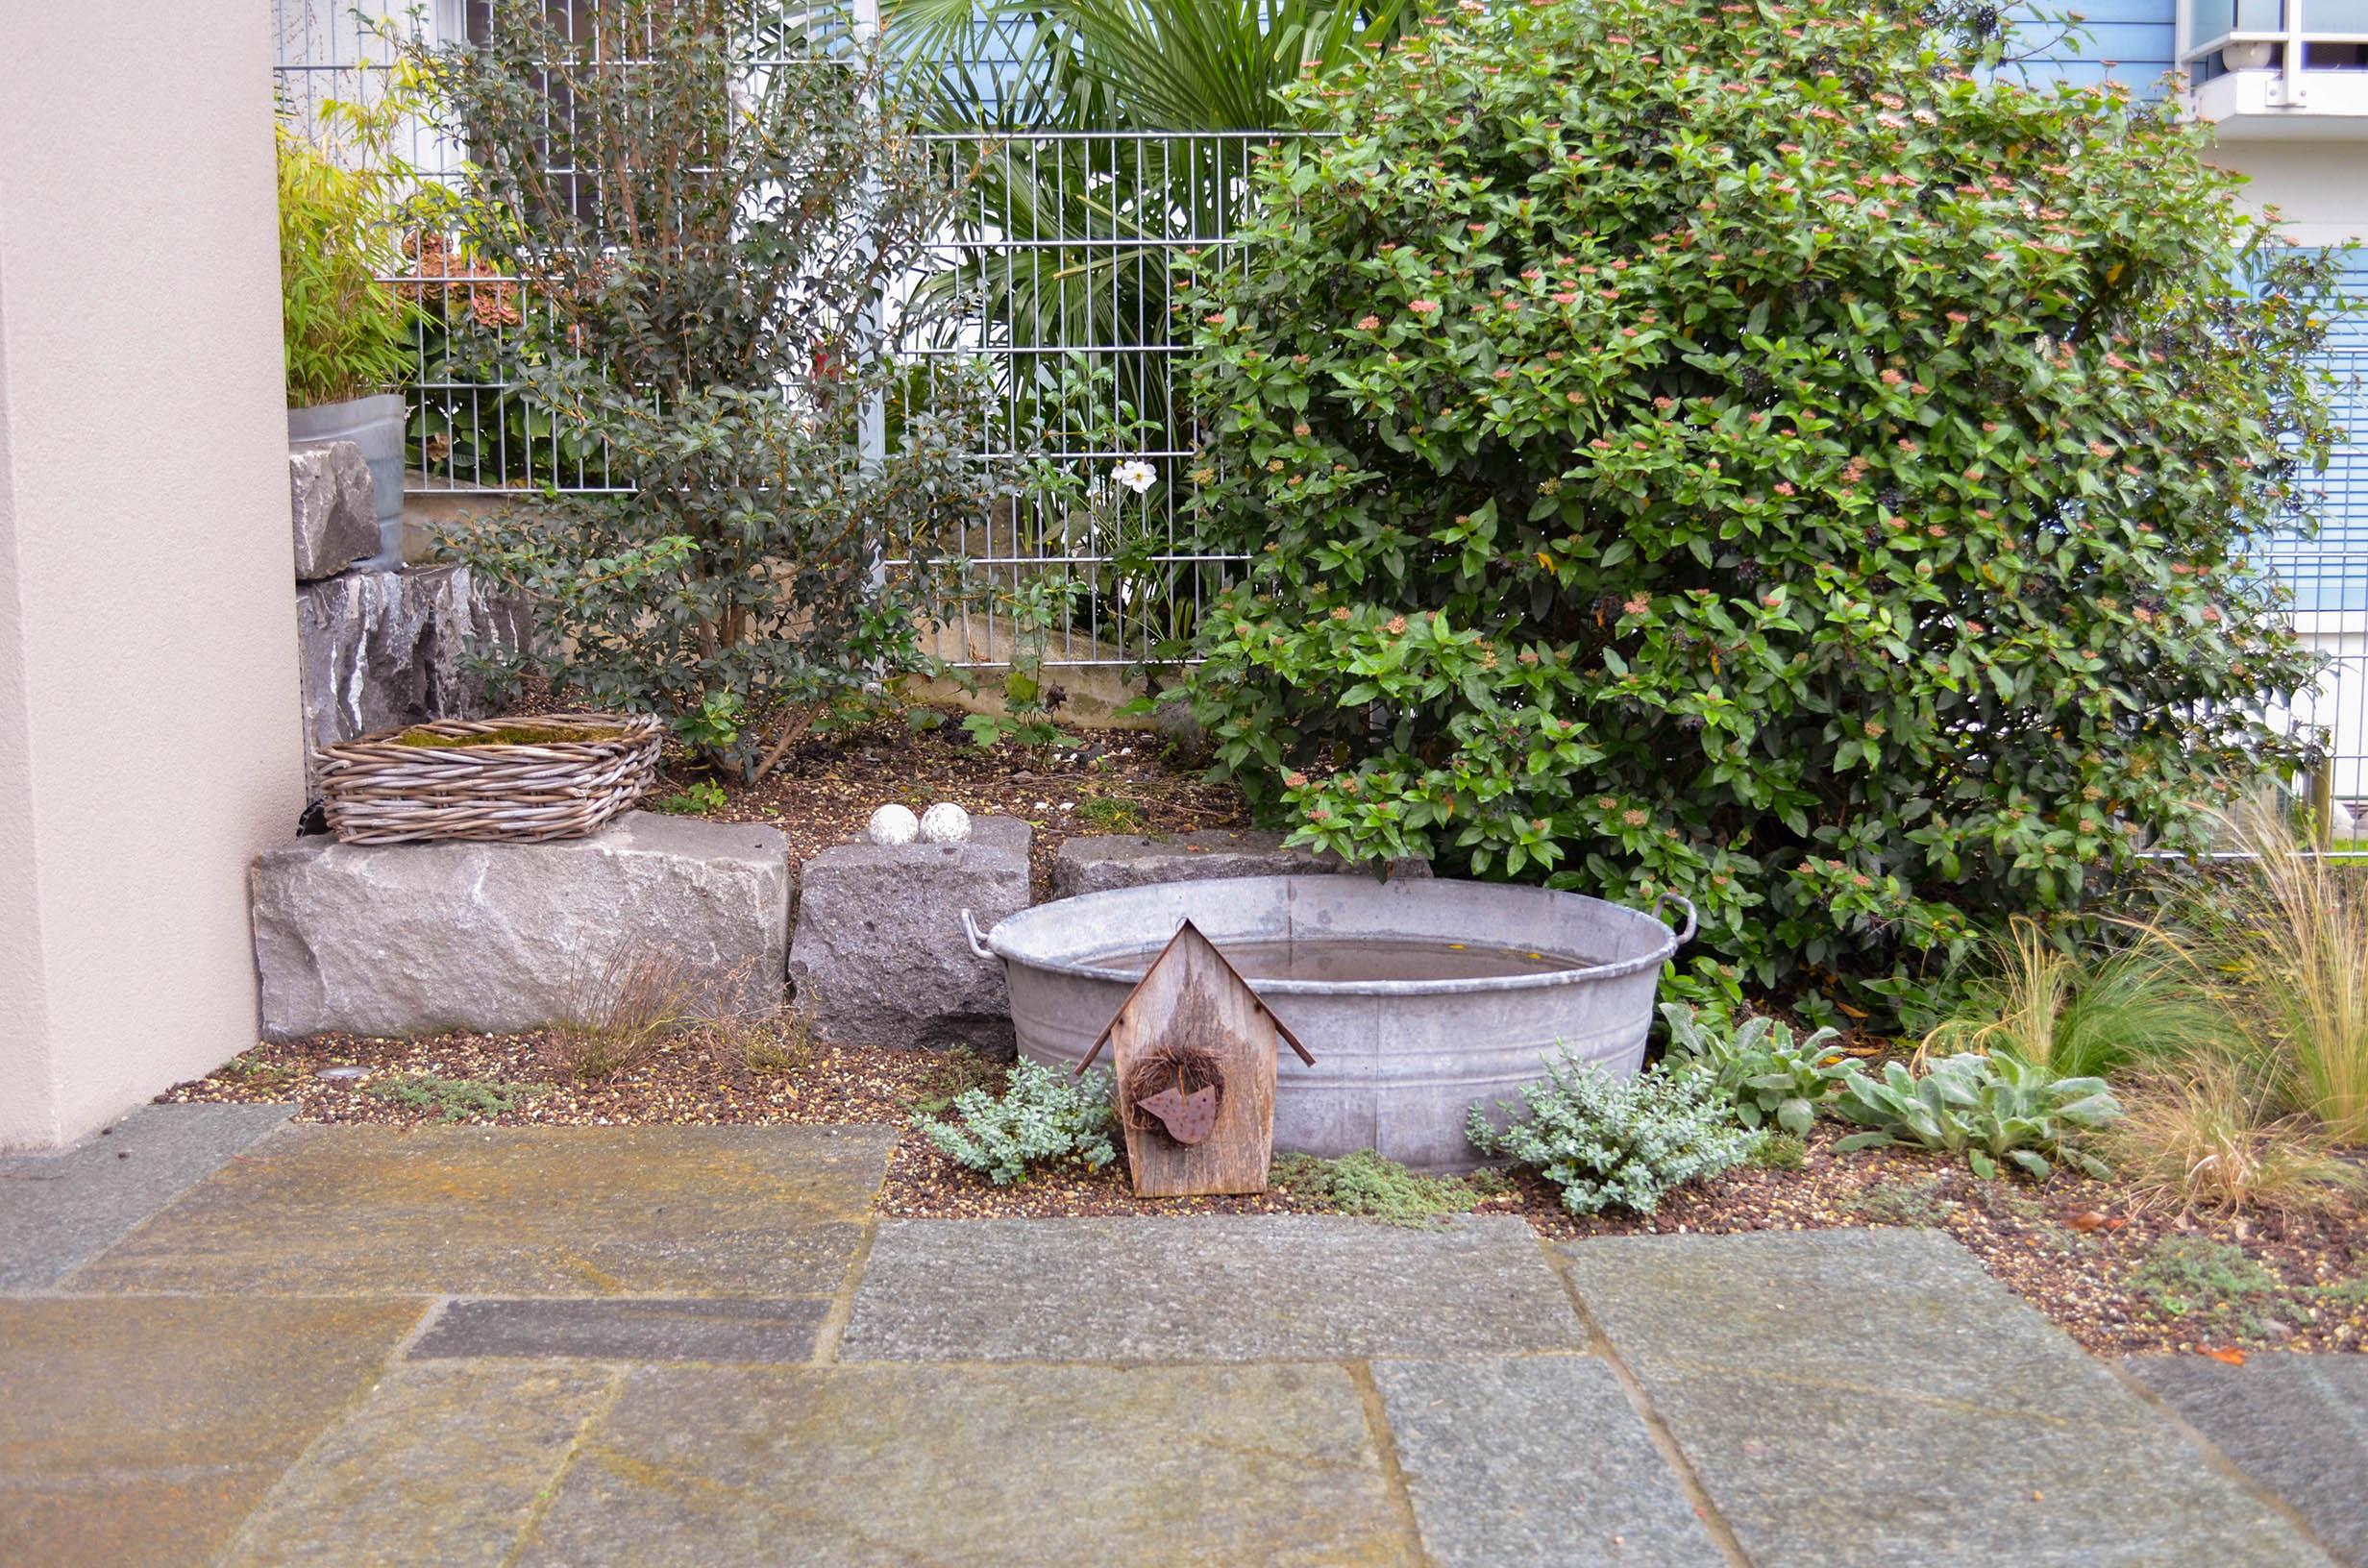 Gartenoase in Buochs 7